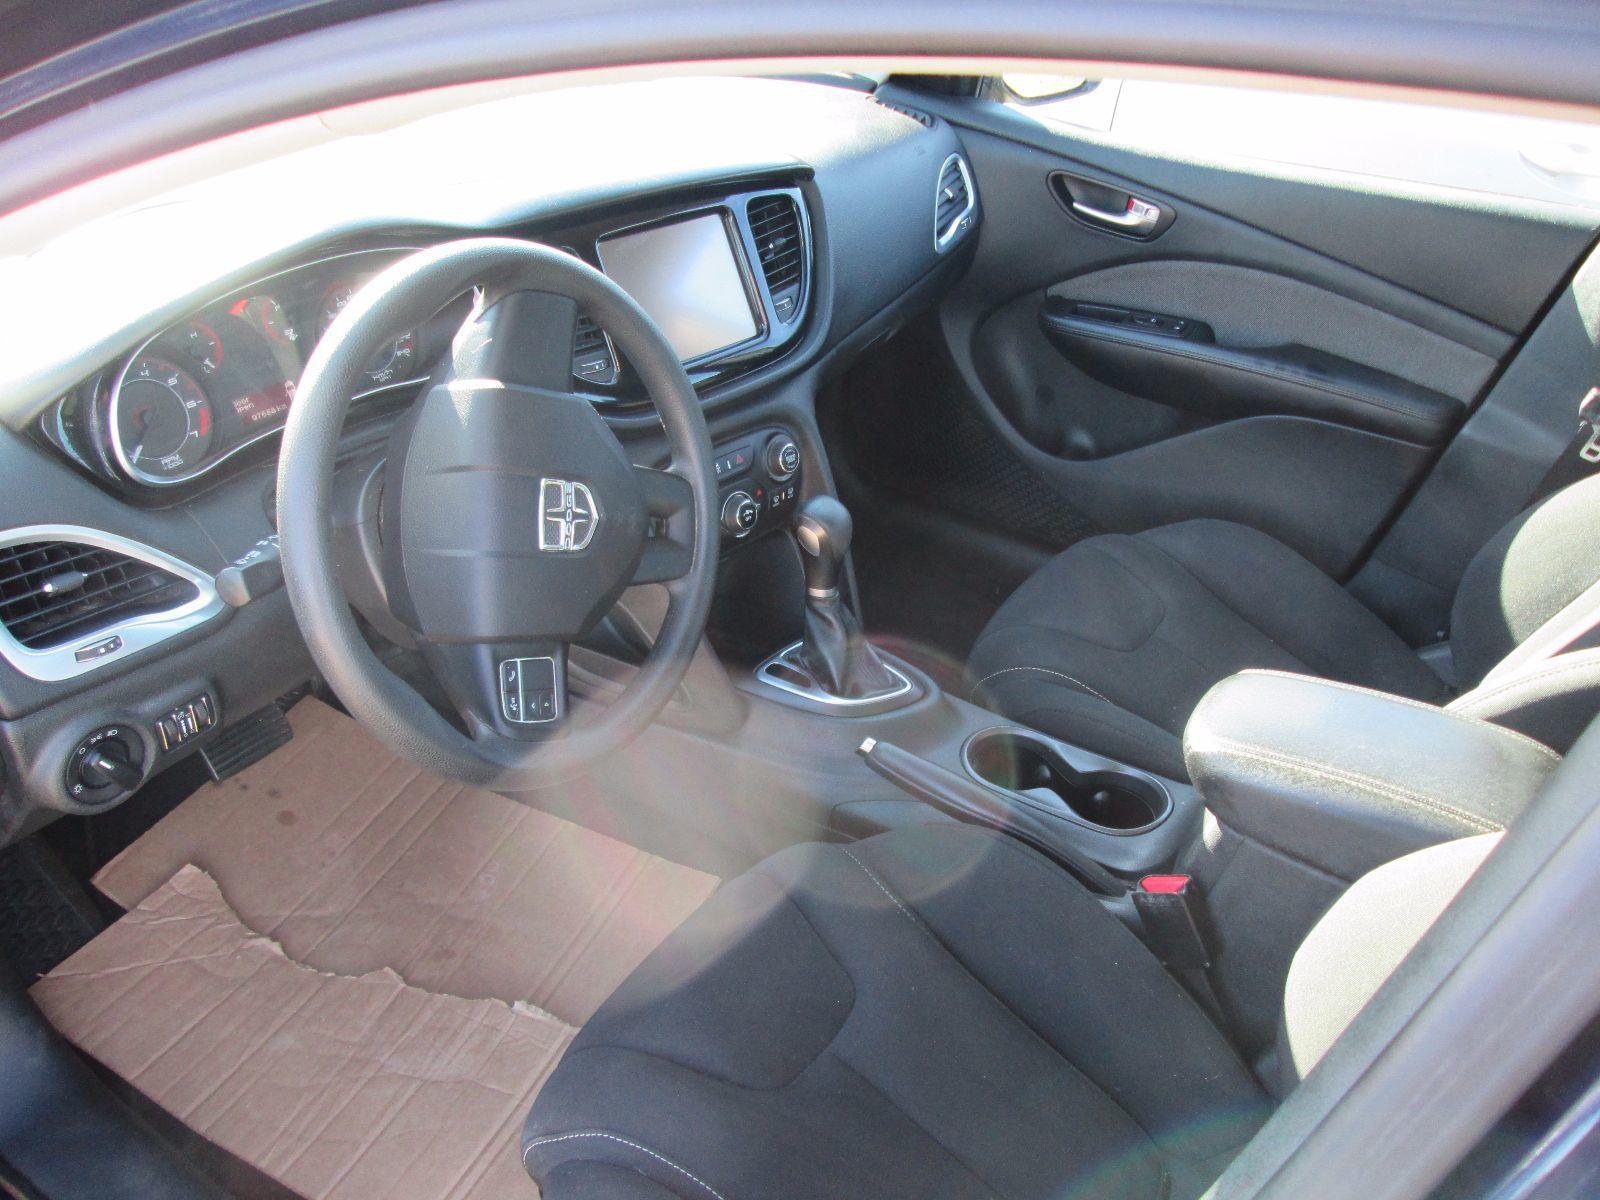 Used 2013 Dodge Dart DART SXT in New Germany - Used